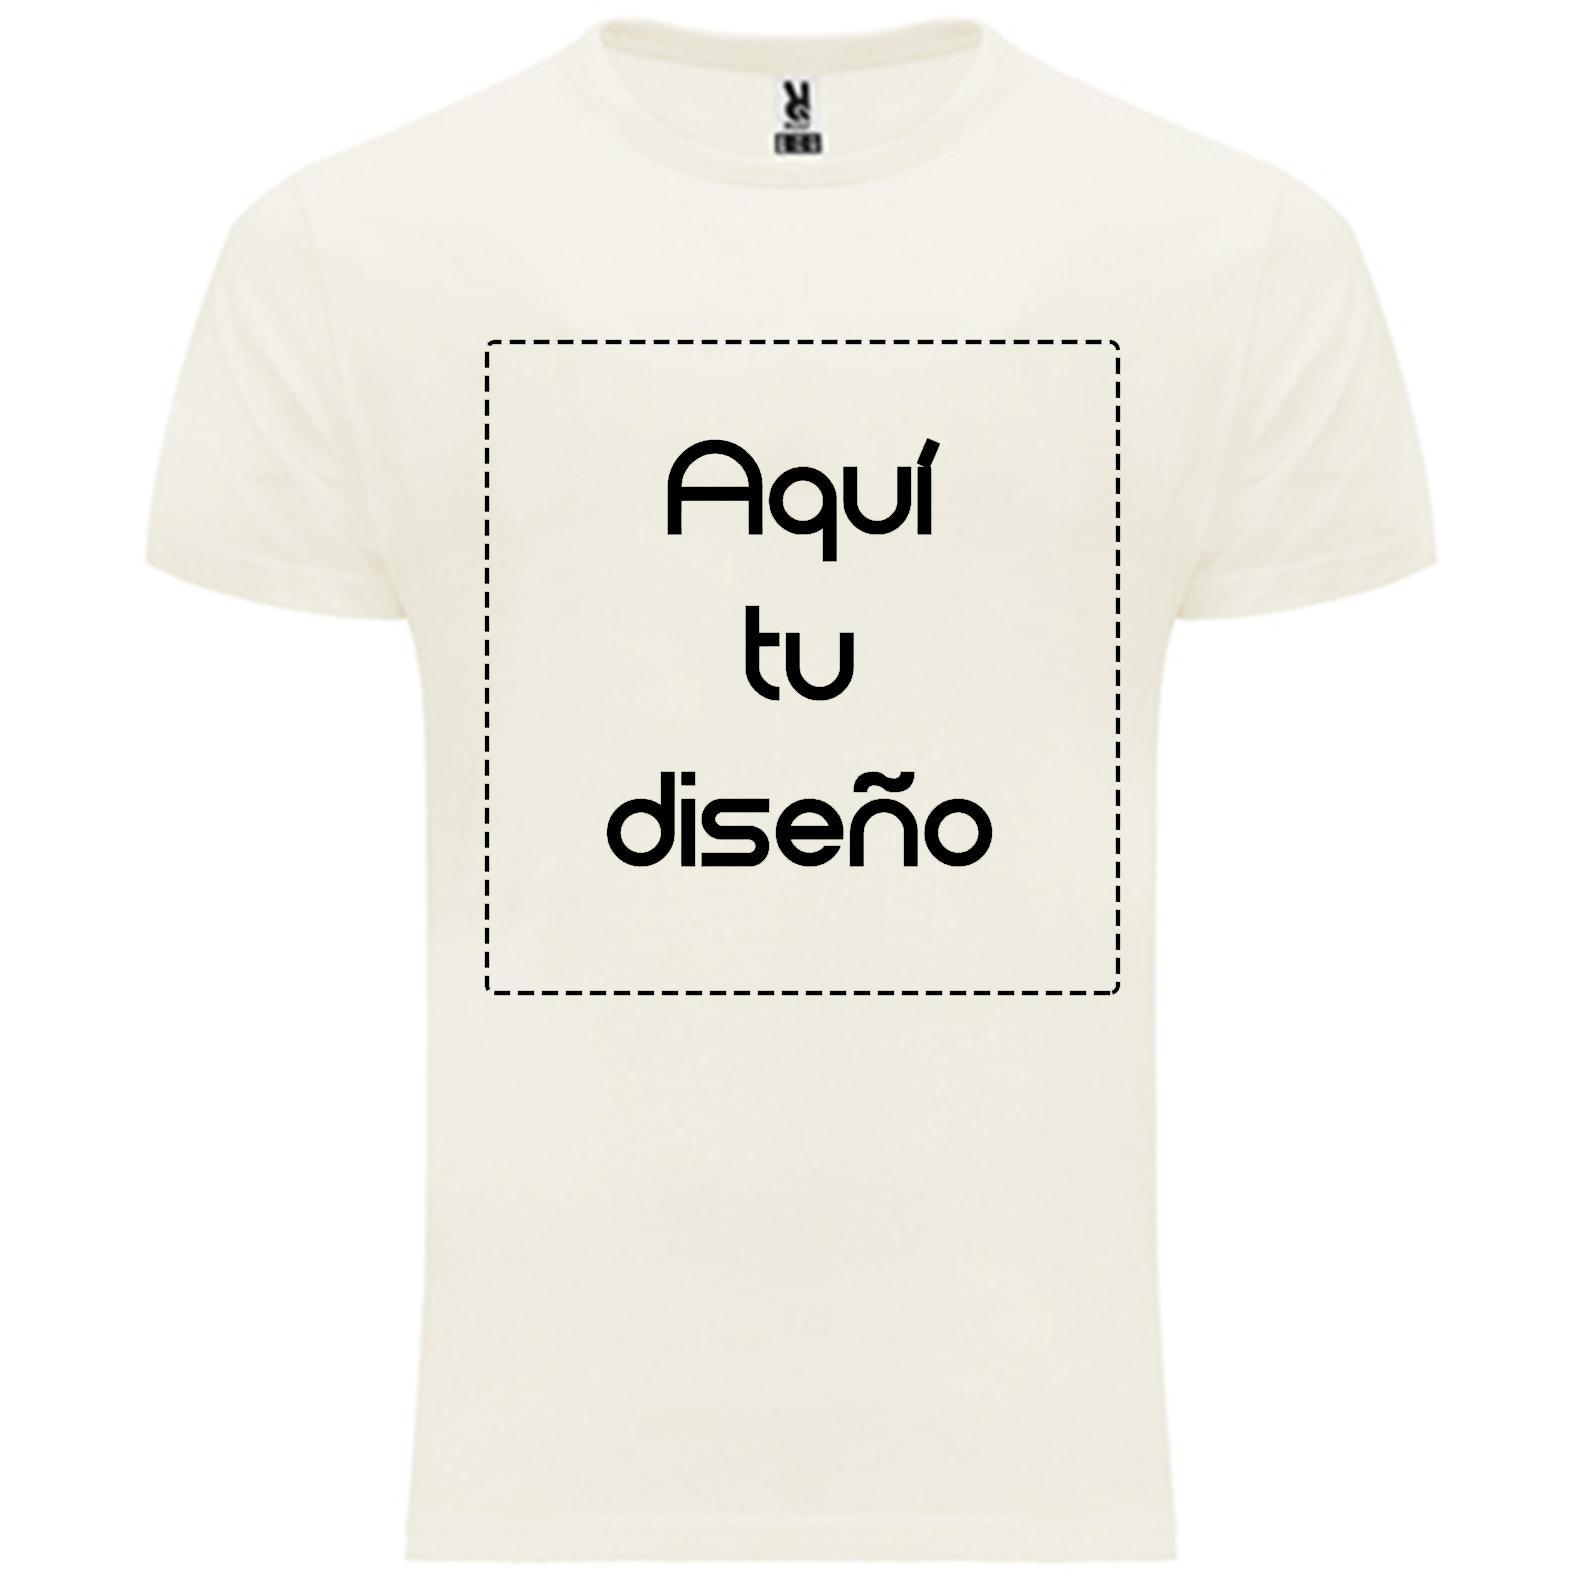 Camiseta orgánica hombre